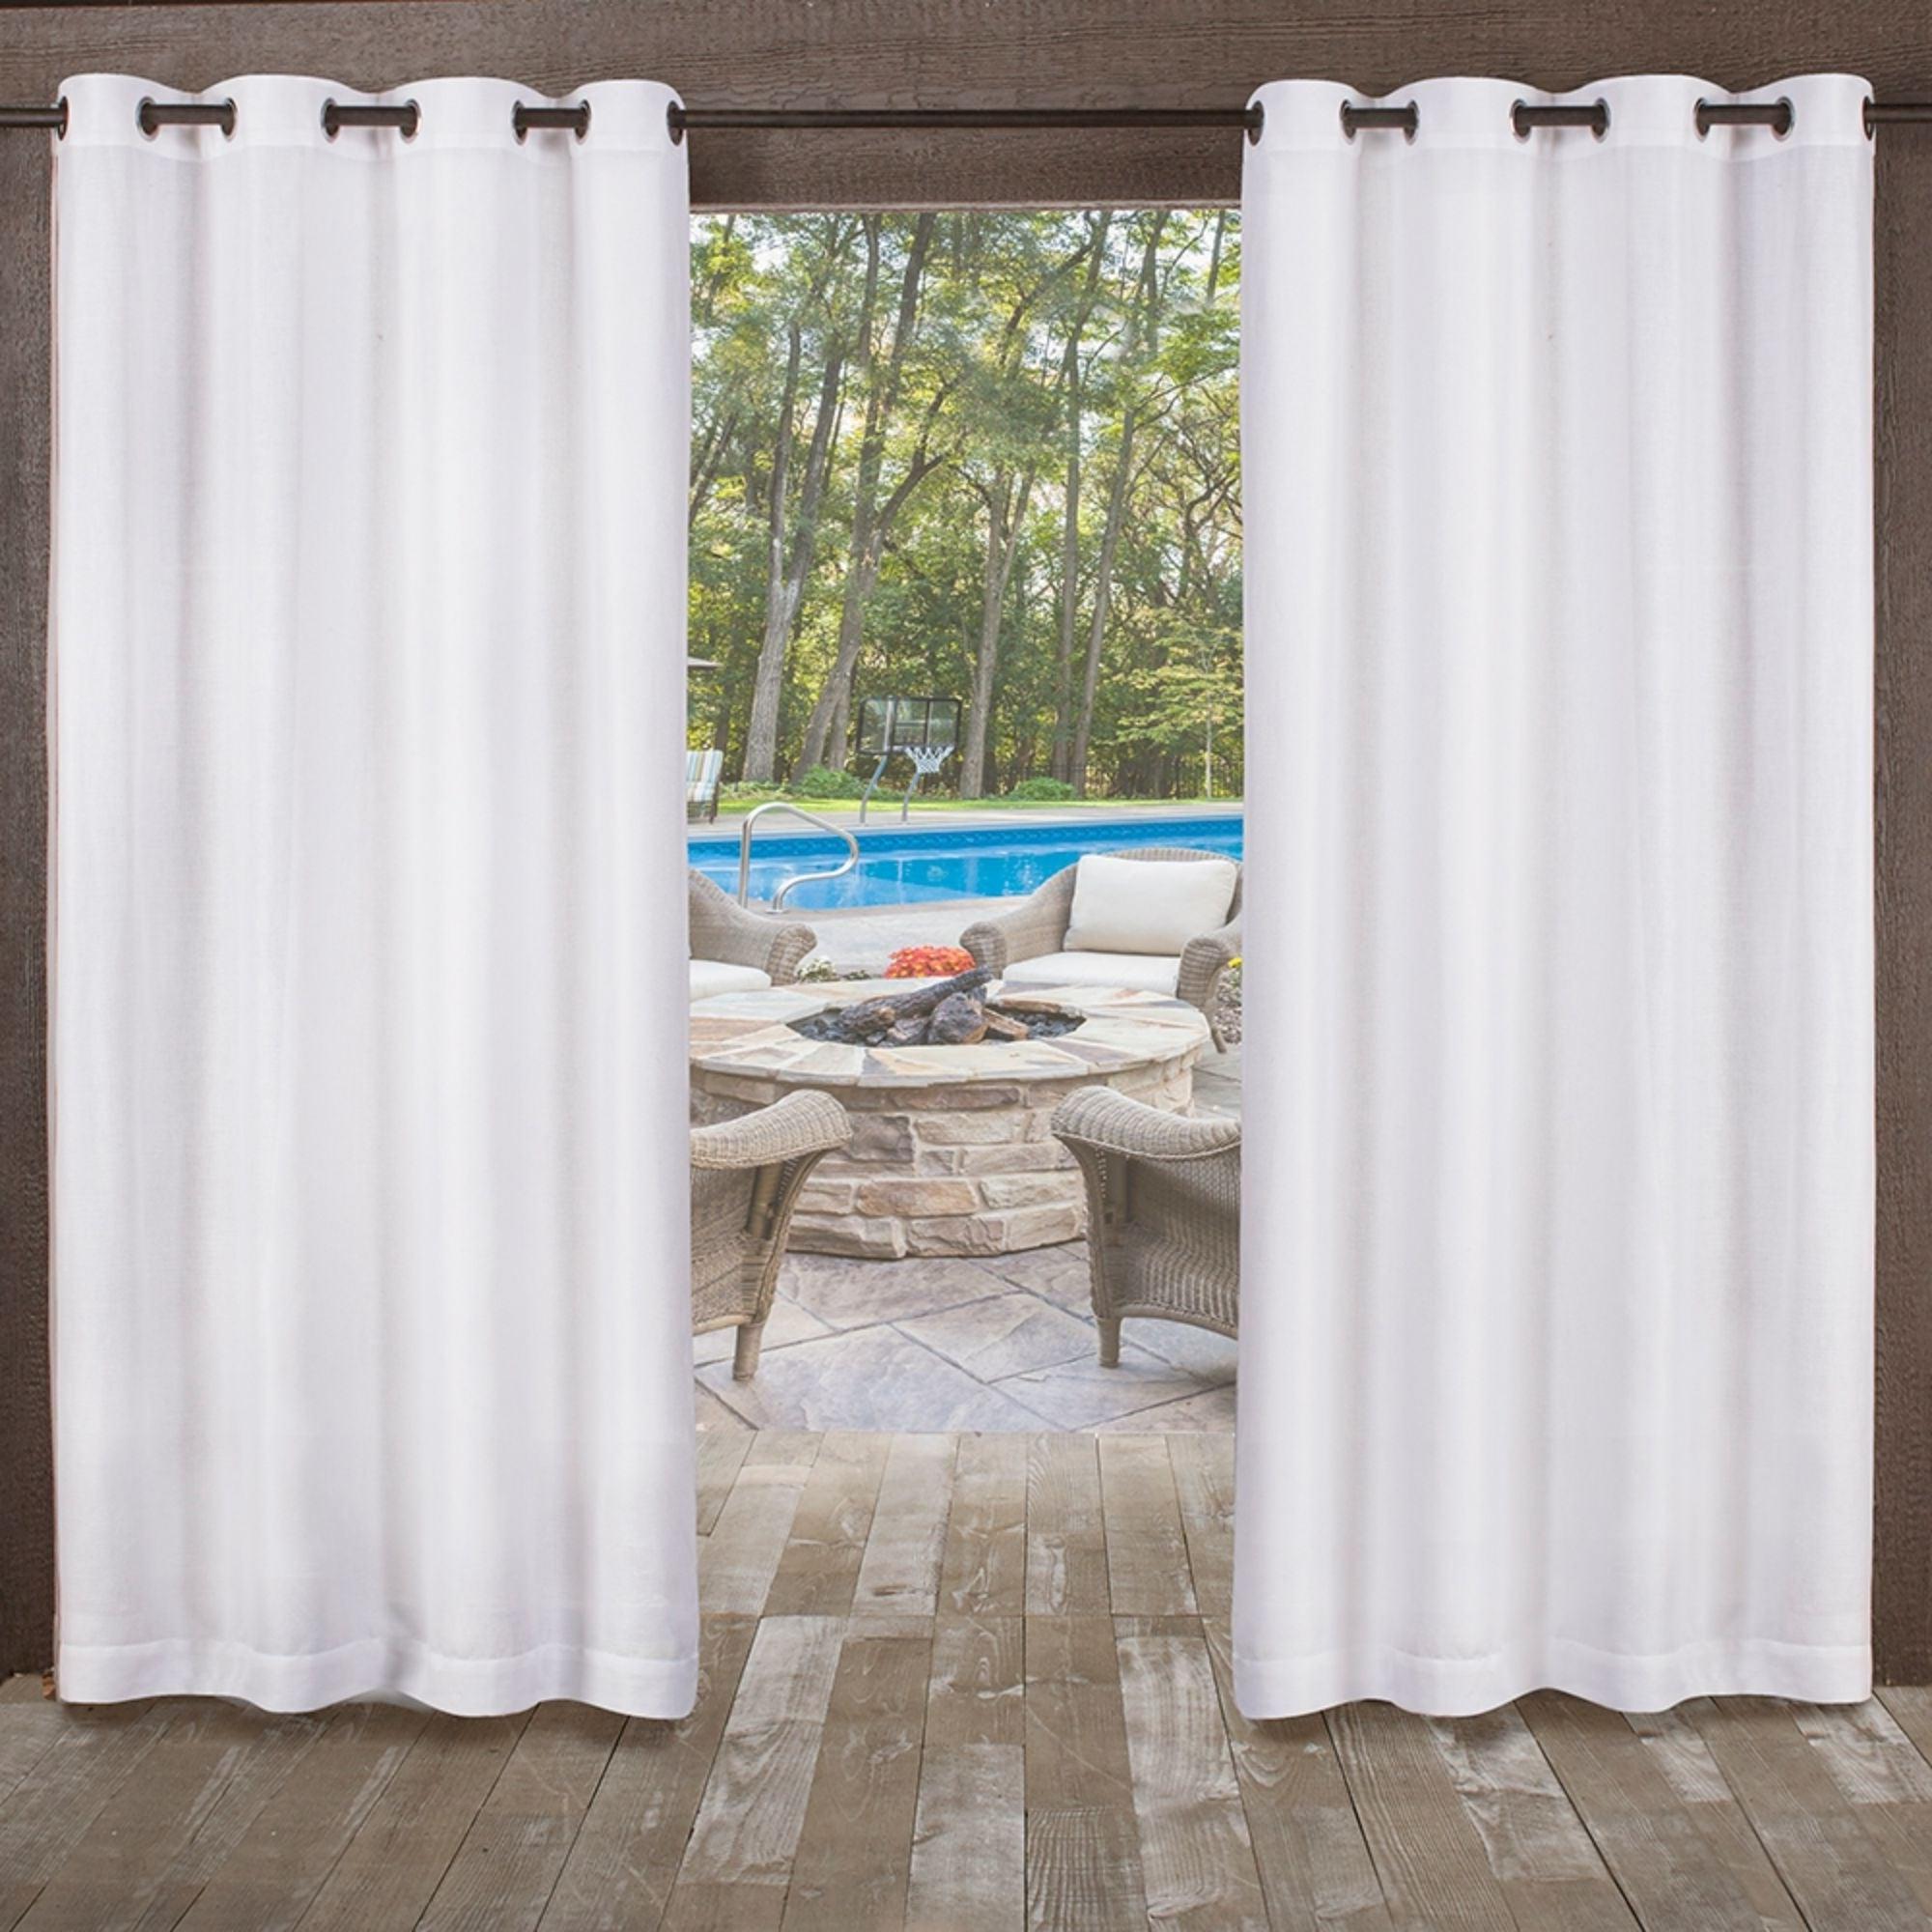 Newest Ati Home Miami Indoor/outdoor Grommet Top Curtain Panel Pair Within Delano Indoor/outdoor Grommet Top Curtain Panel Pairs (View 4 of 20)